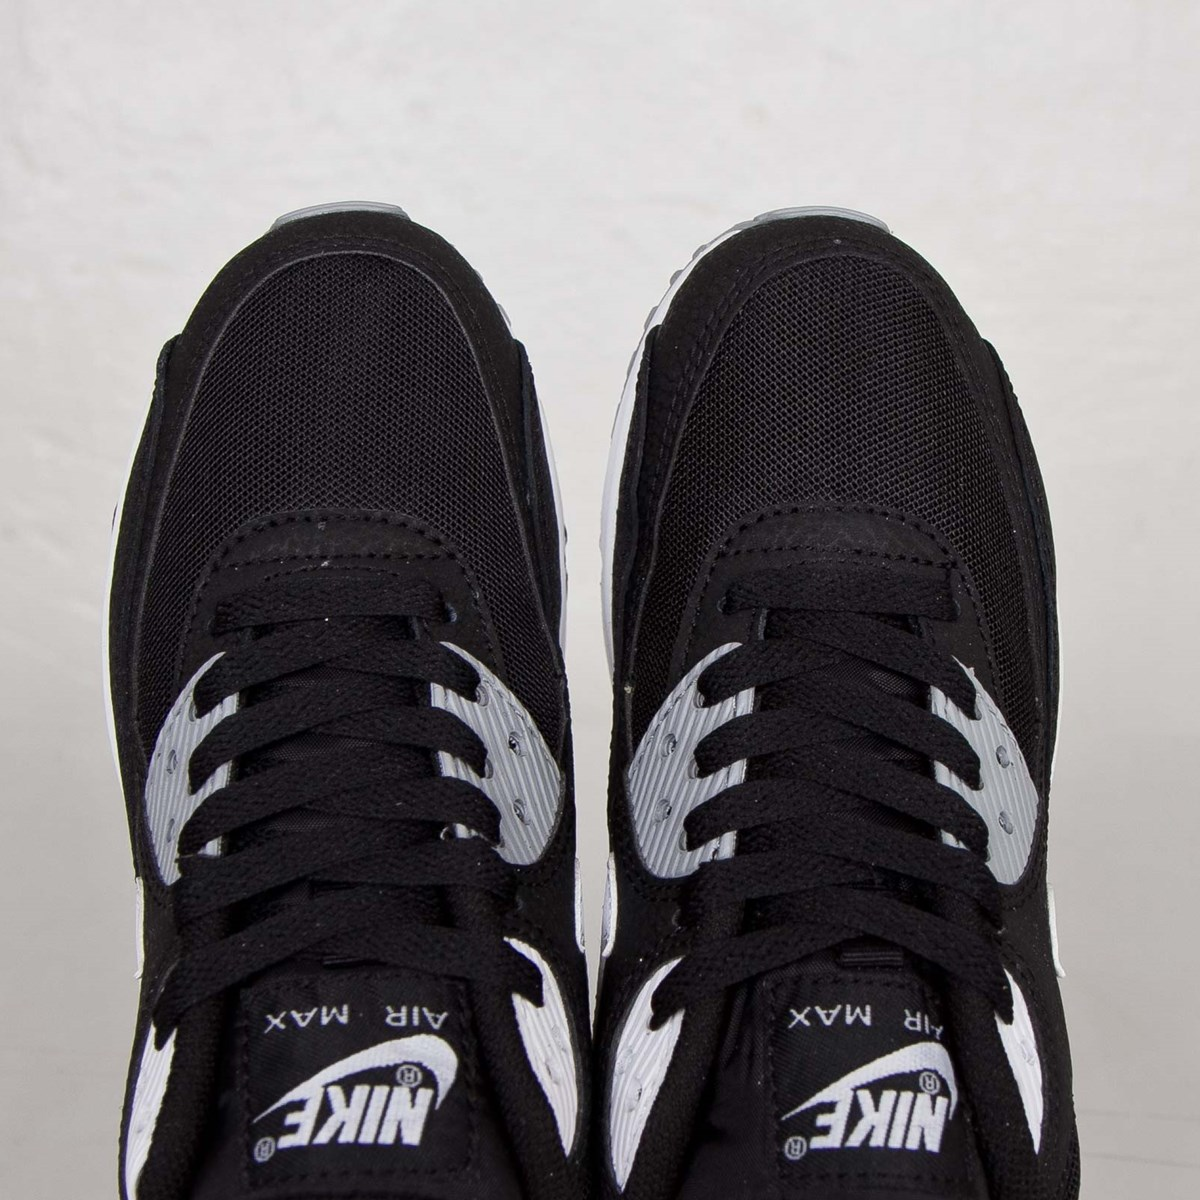 Nike Wmns Air Max 90 Essential 616730 012 Sneakersnstuff